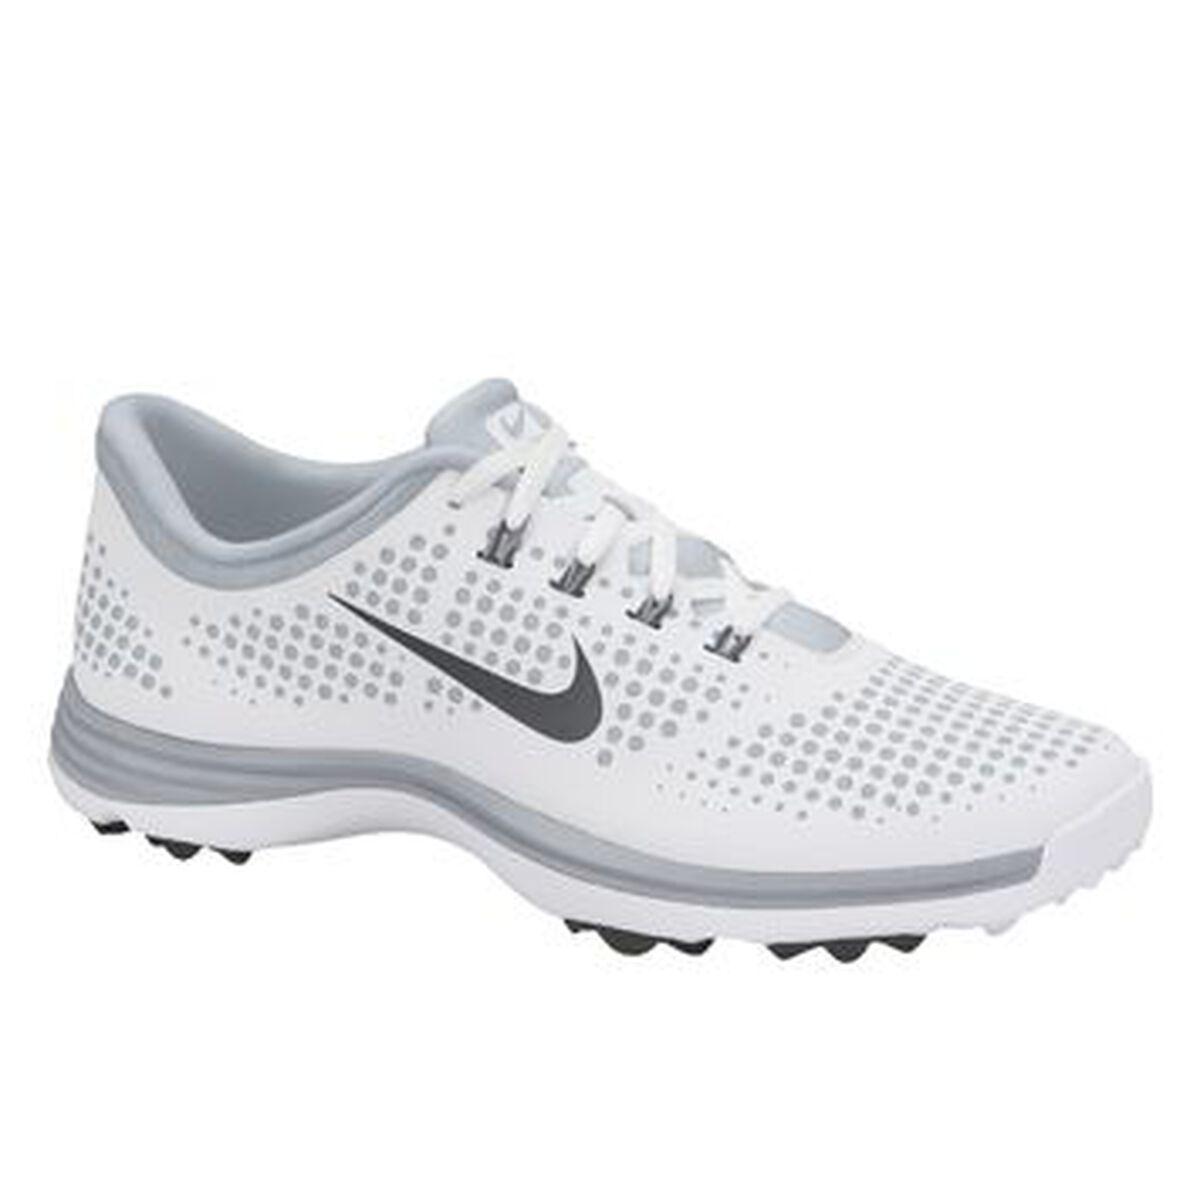 sneakers for cheap d69d6 0723a Images. Nike Lunar Empress Women  39 s Golf Shoe